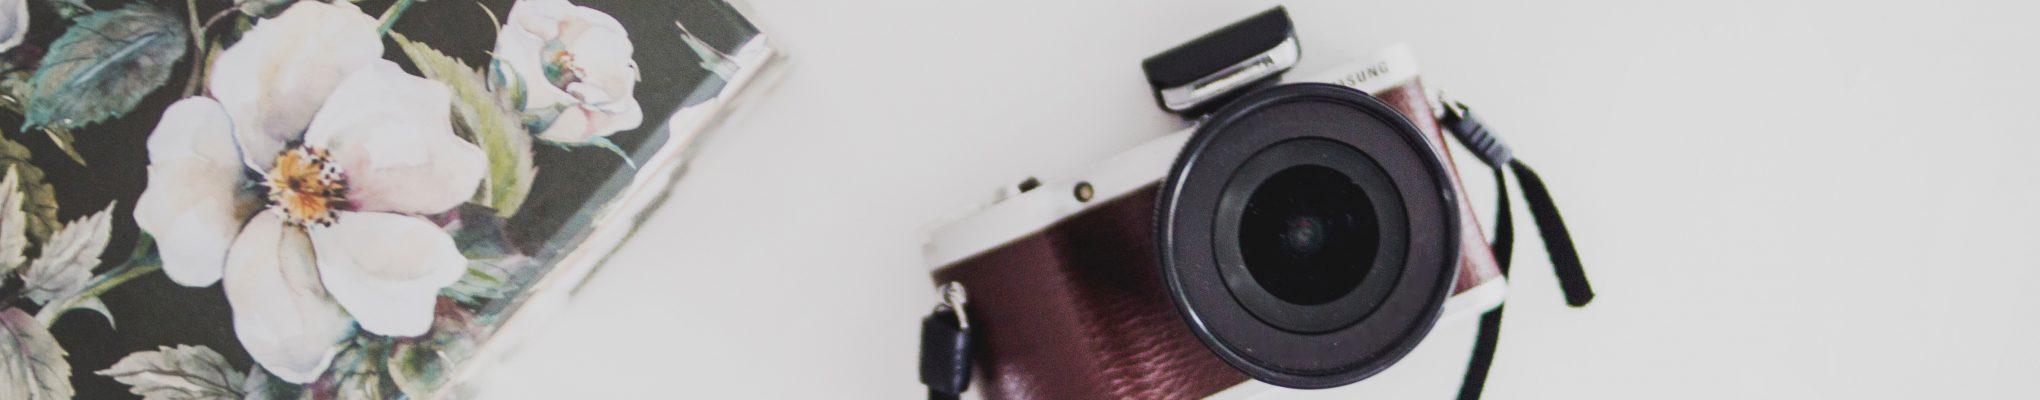 boves-box-camera-1182679